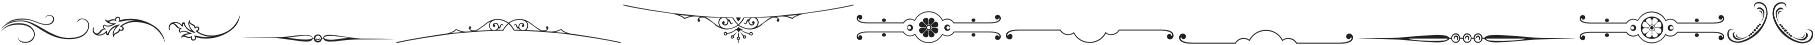 Gracia Ornaments otf (400) Font LOWERCASE